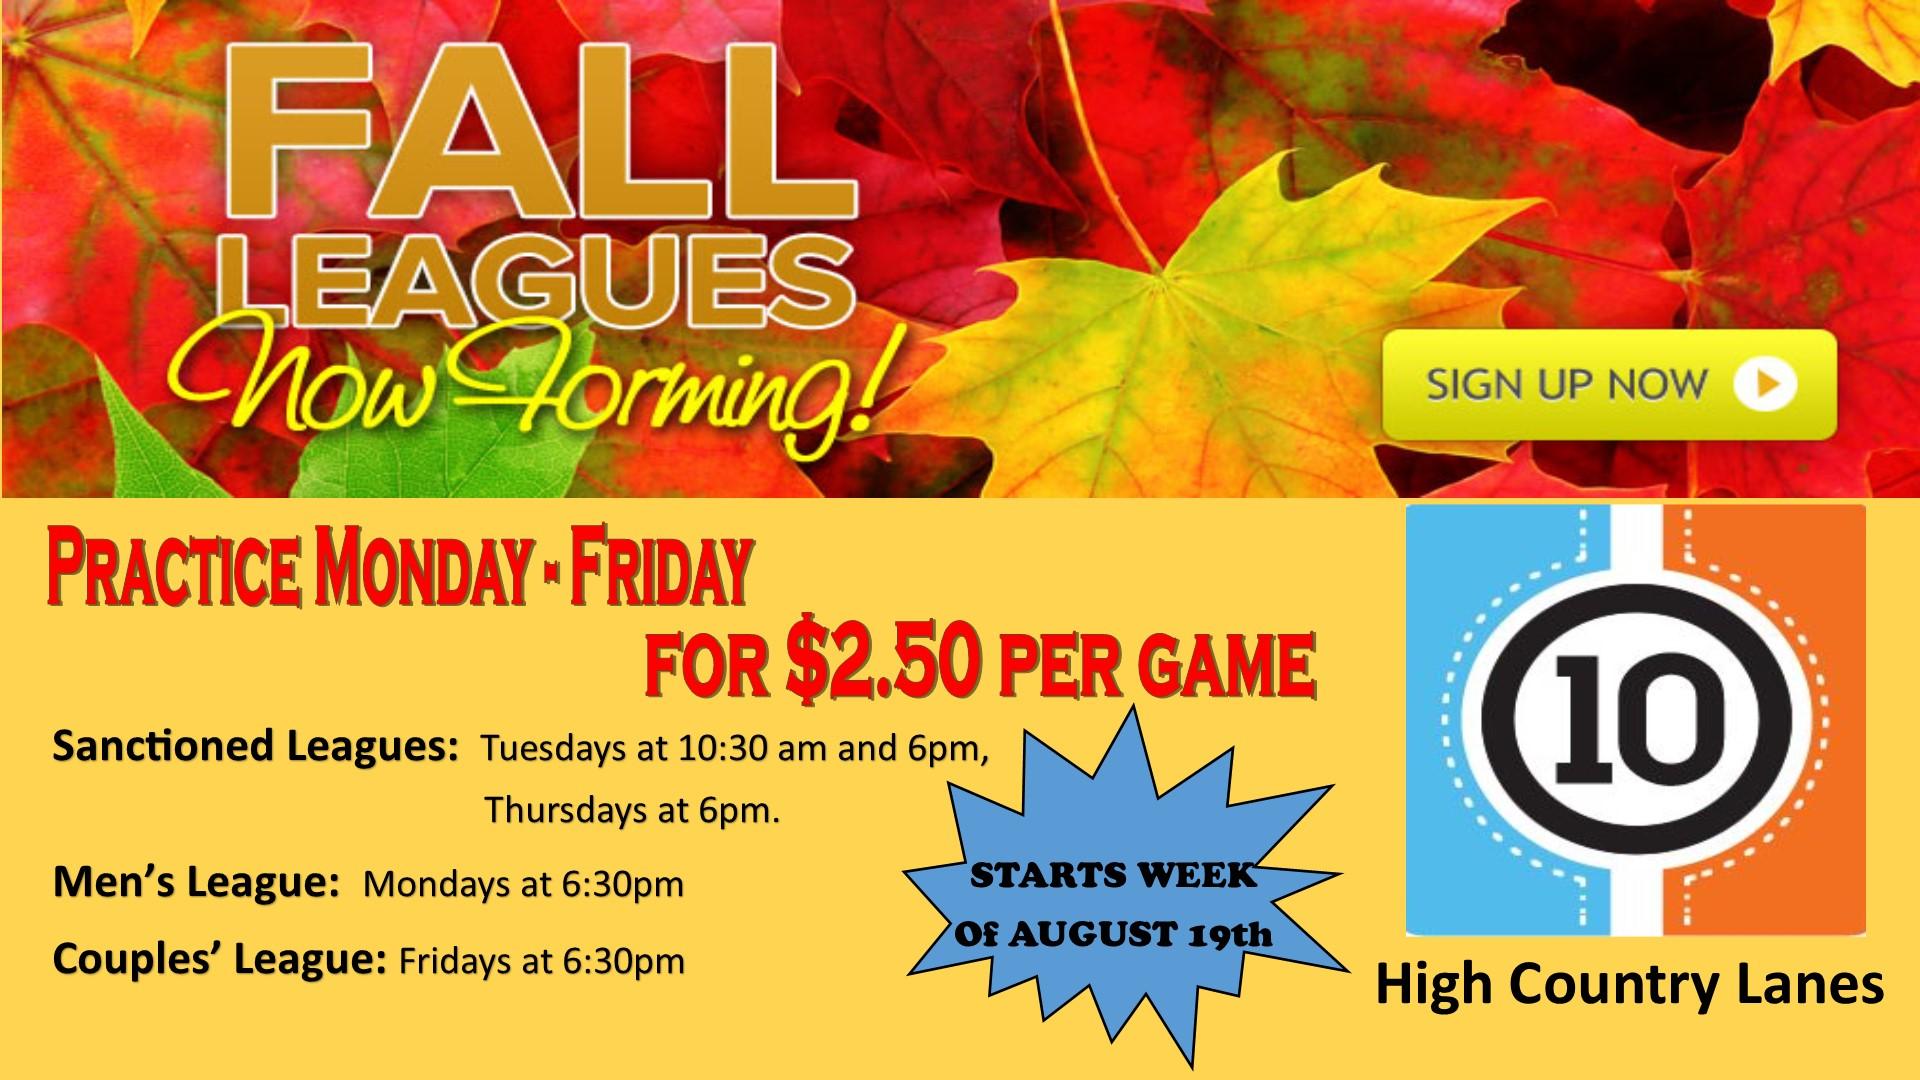 Fall League website